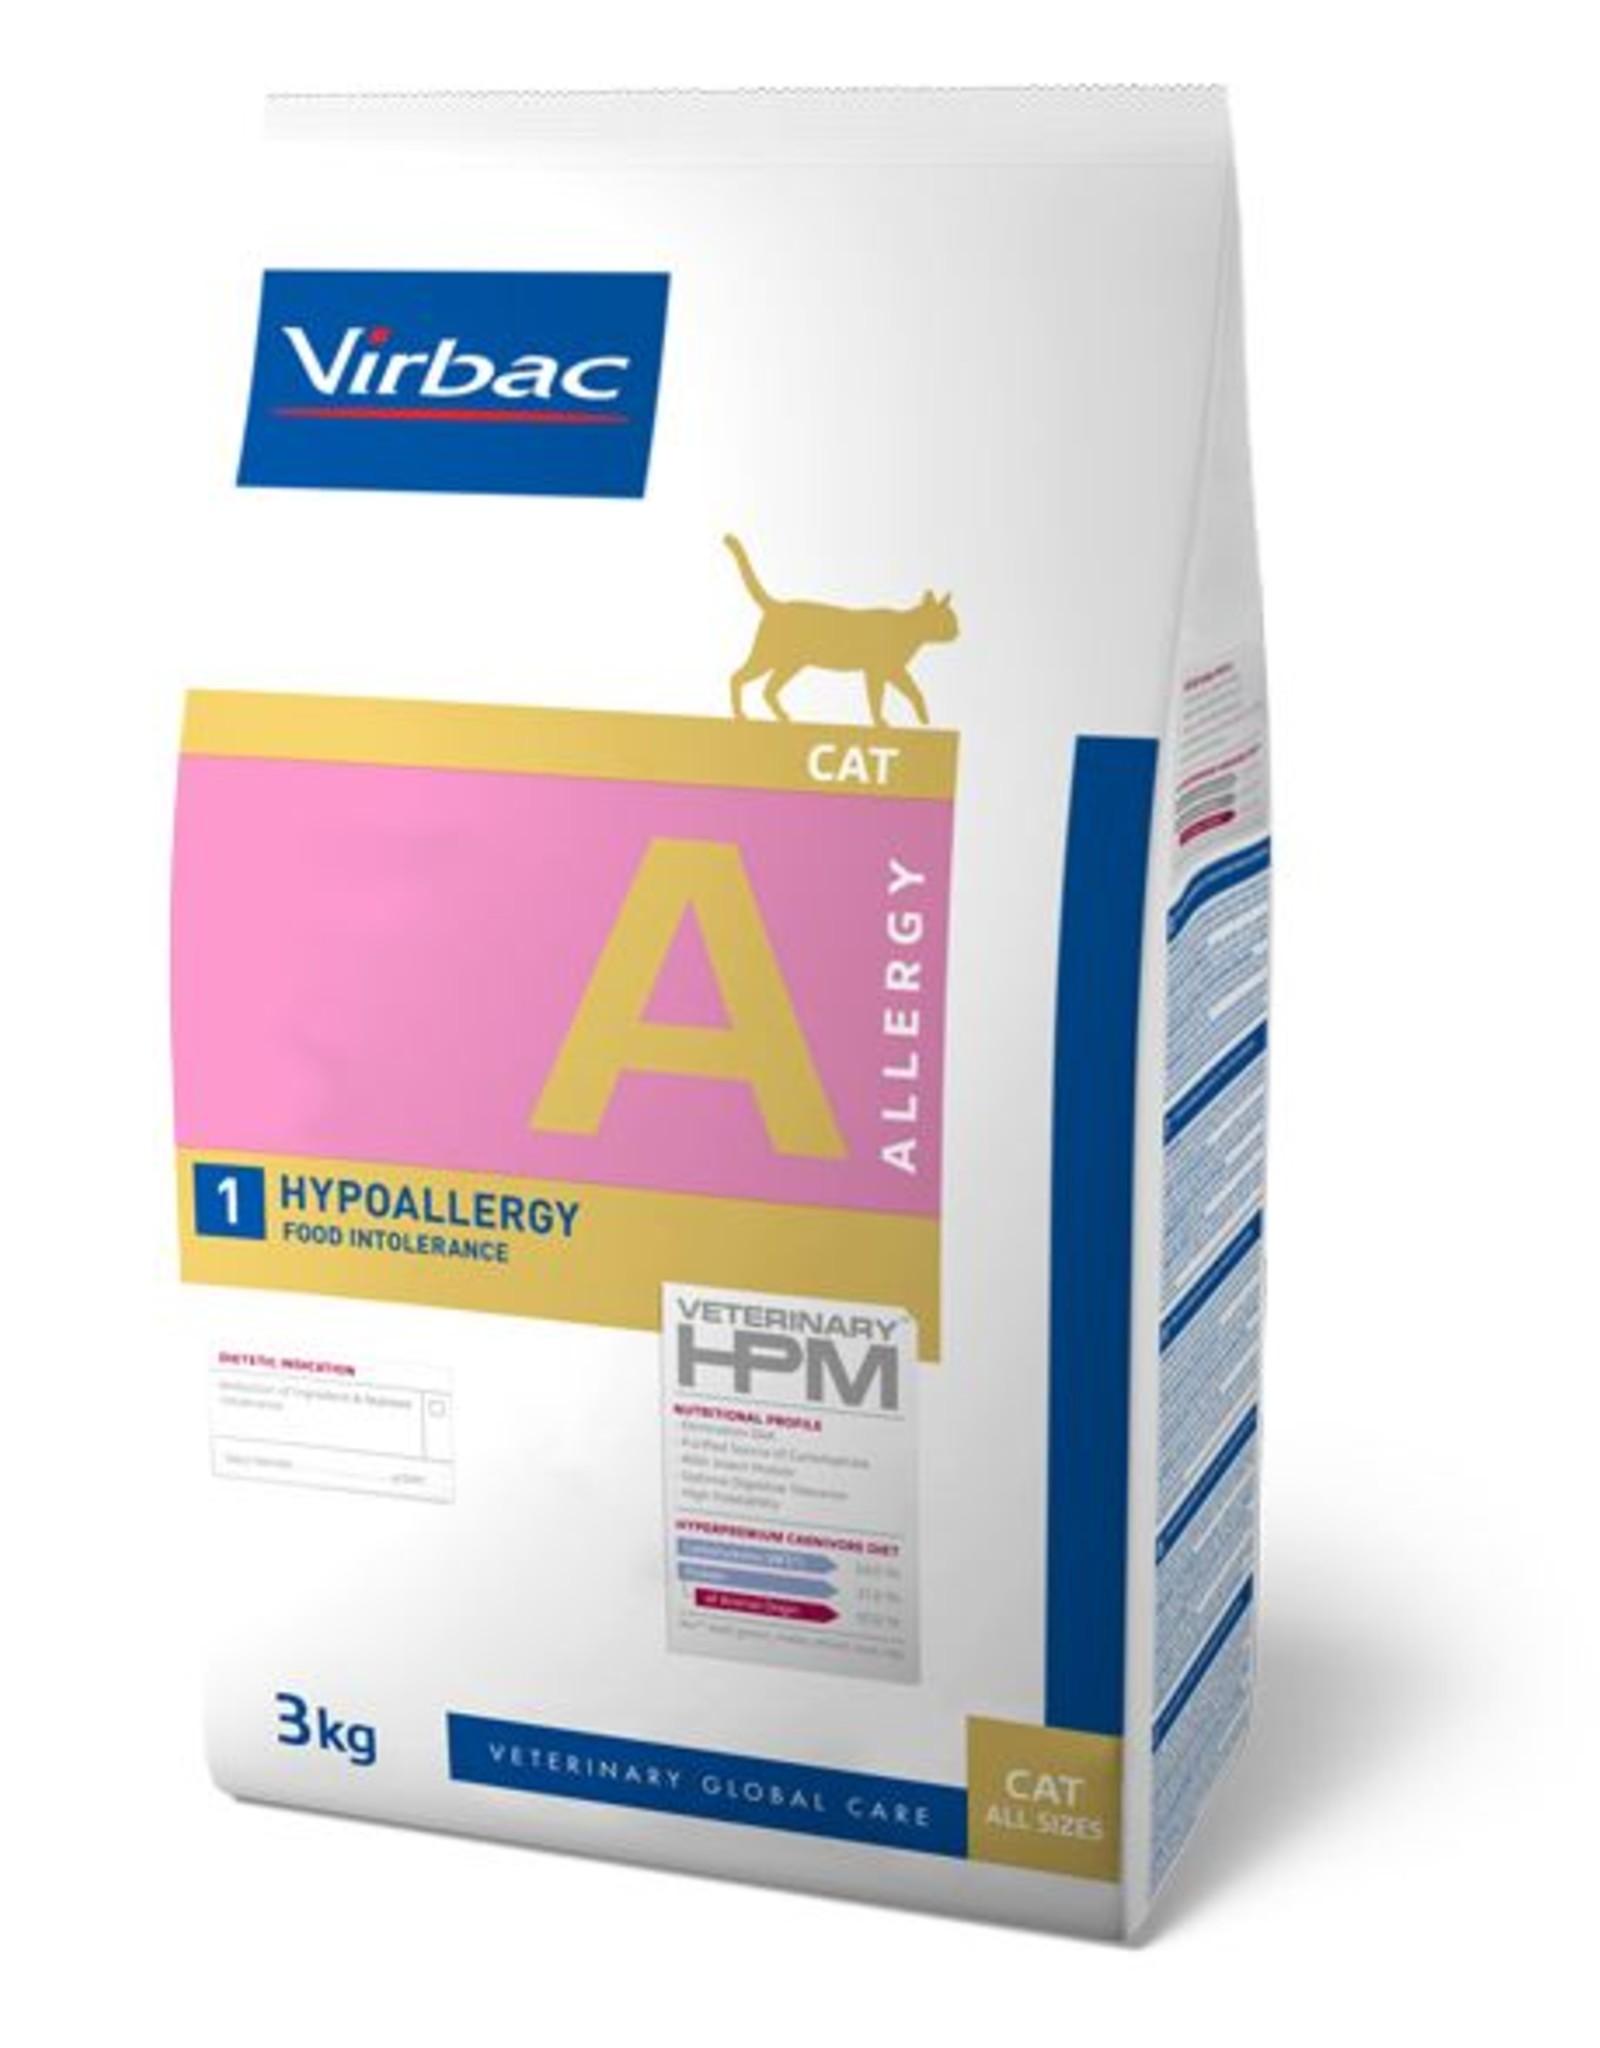 Virbac Virbac Hpm Cat Hypo Allergy A1 3kg